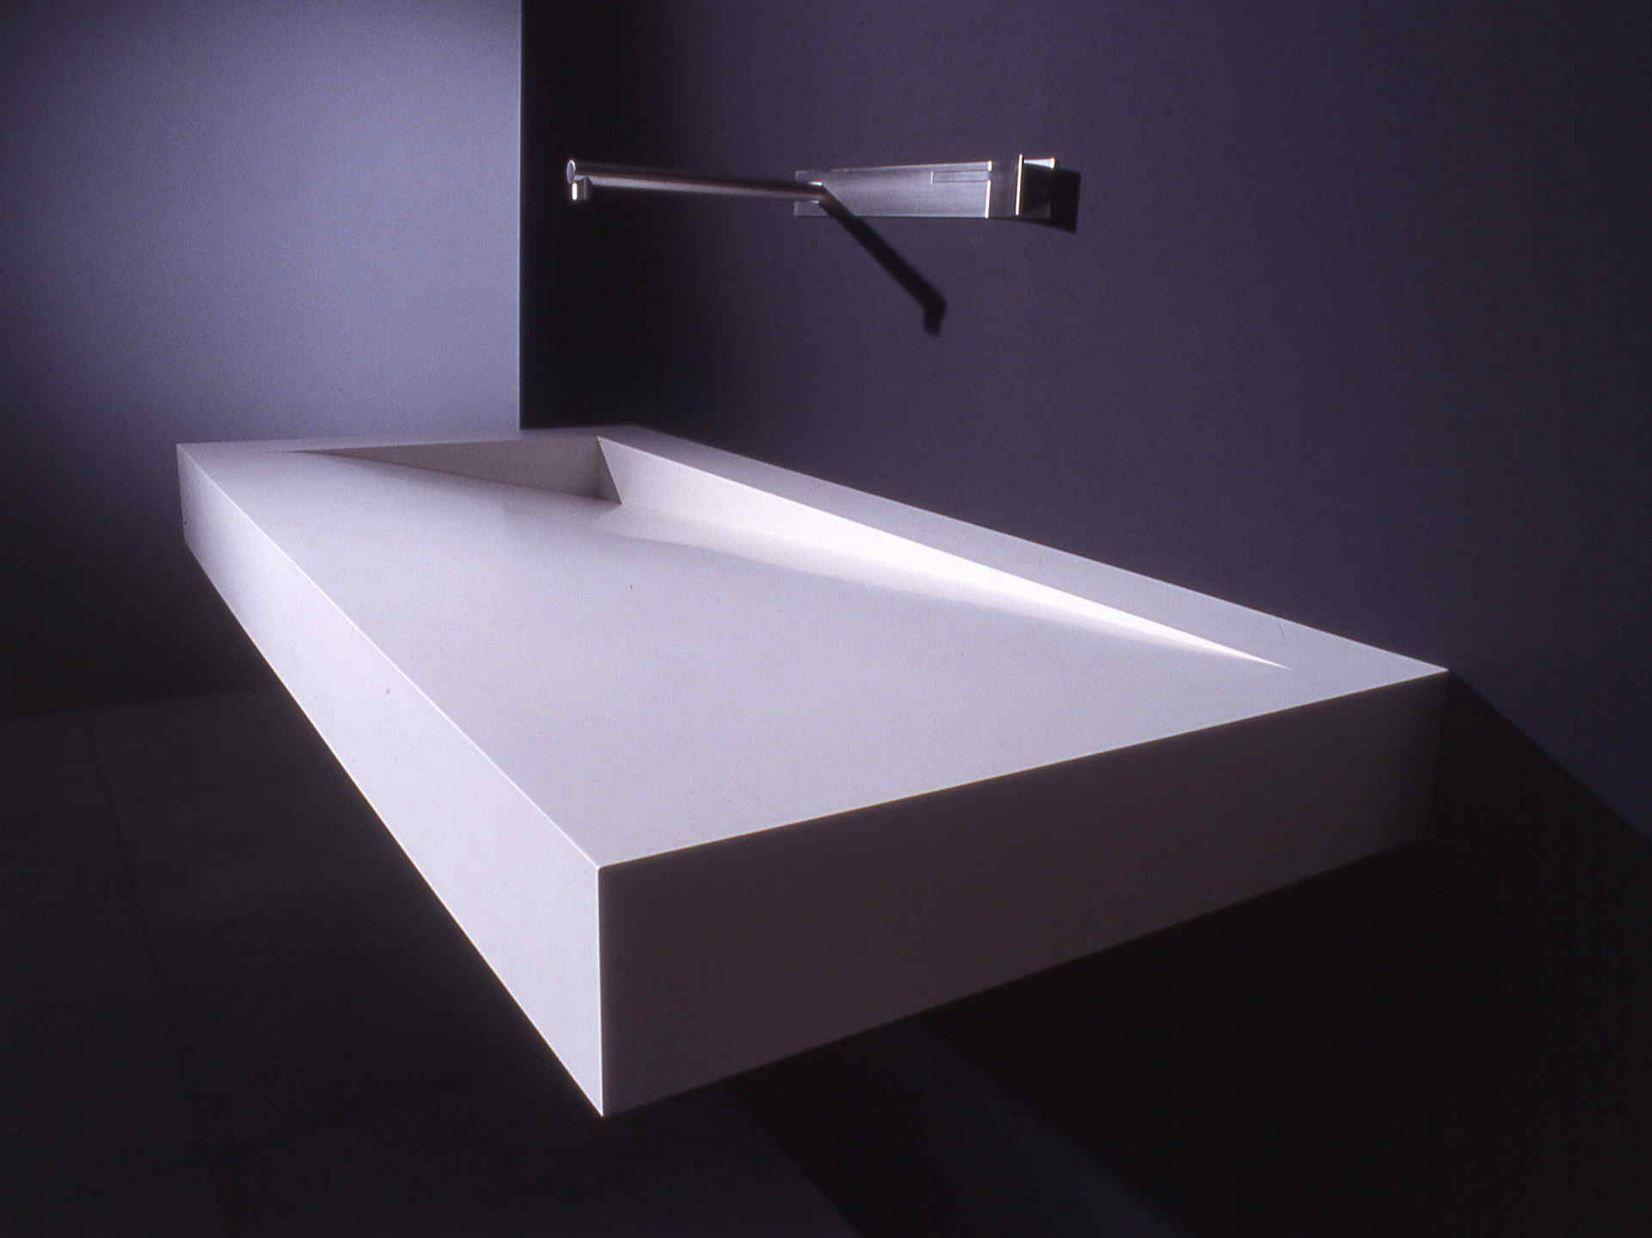 lavabo rectangulaire en corian folio by boffi design. Black Bedroom Furniture Sets. Home Design Ideas